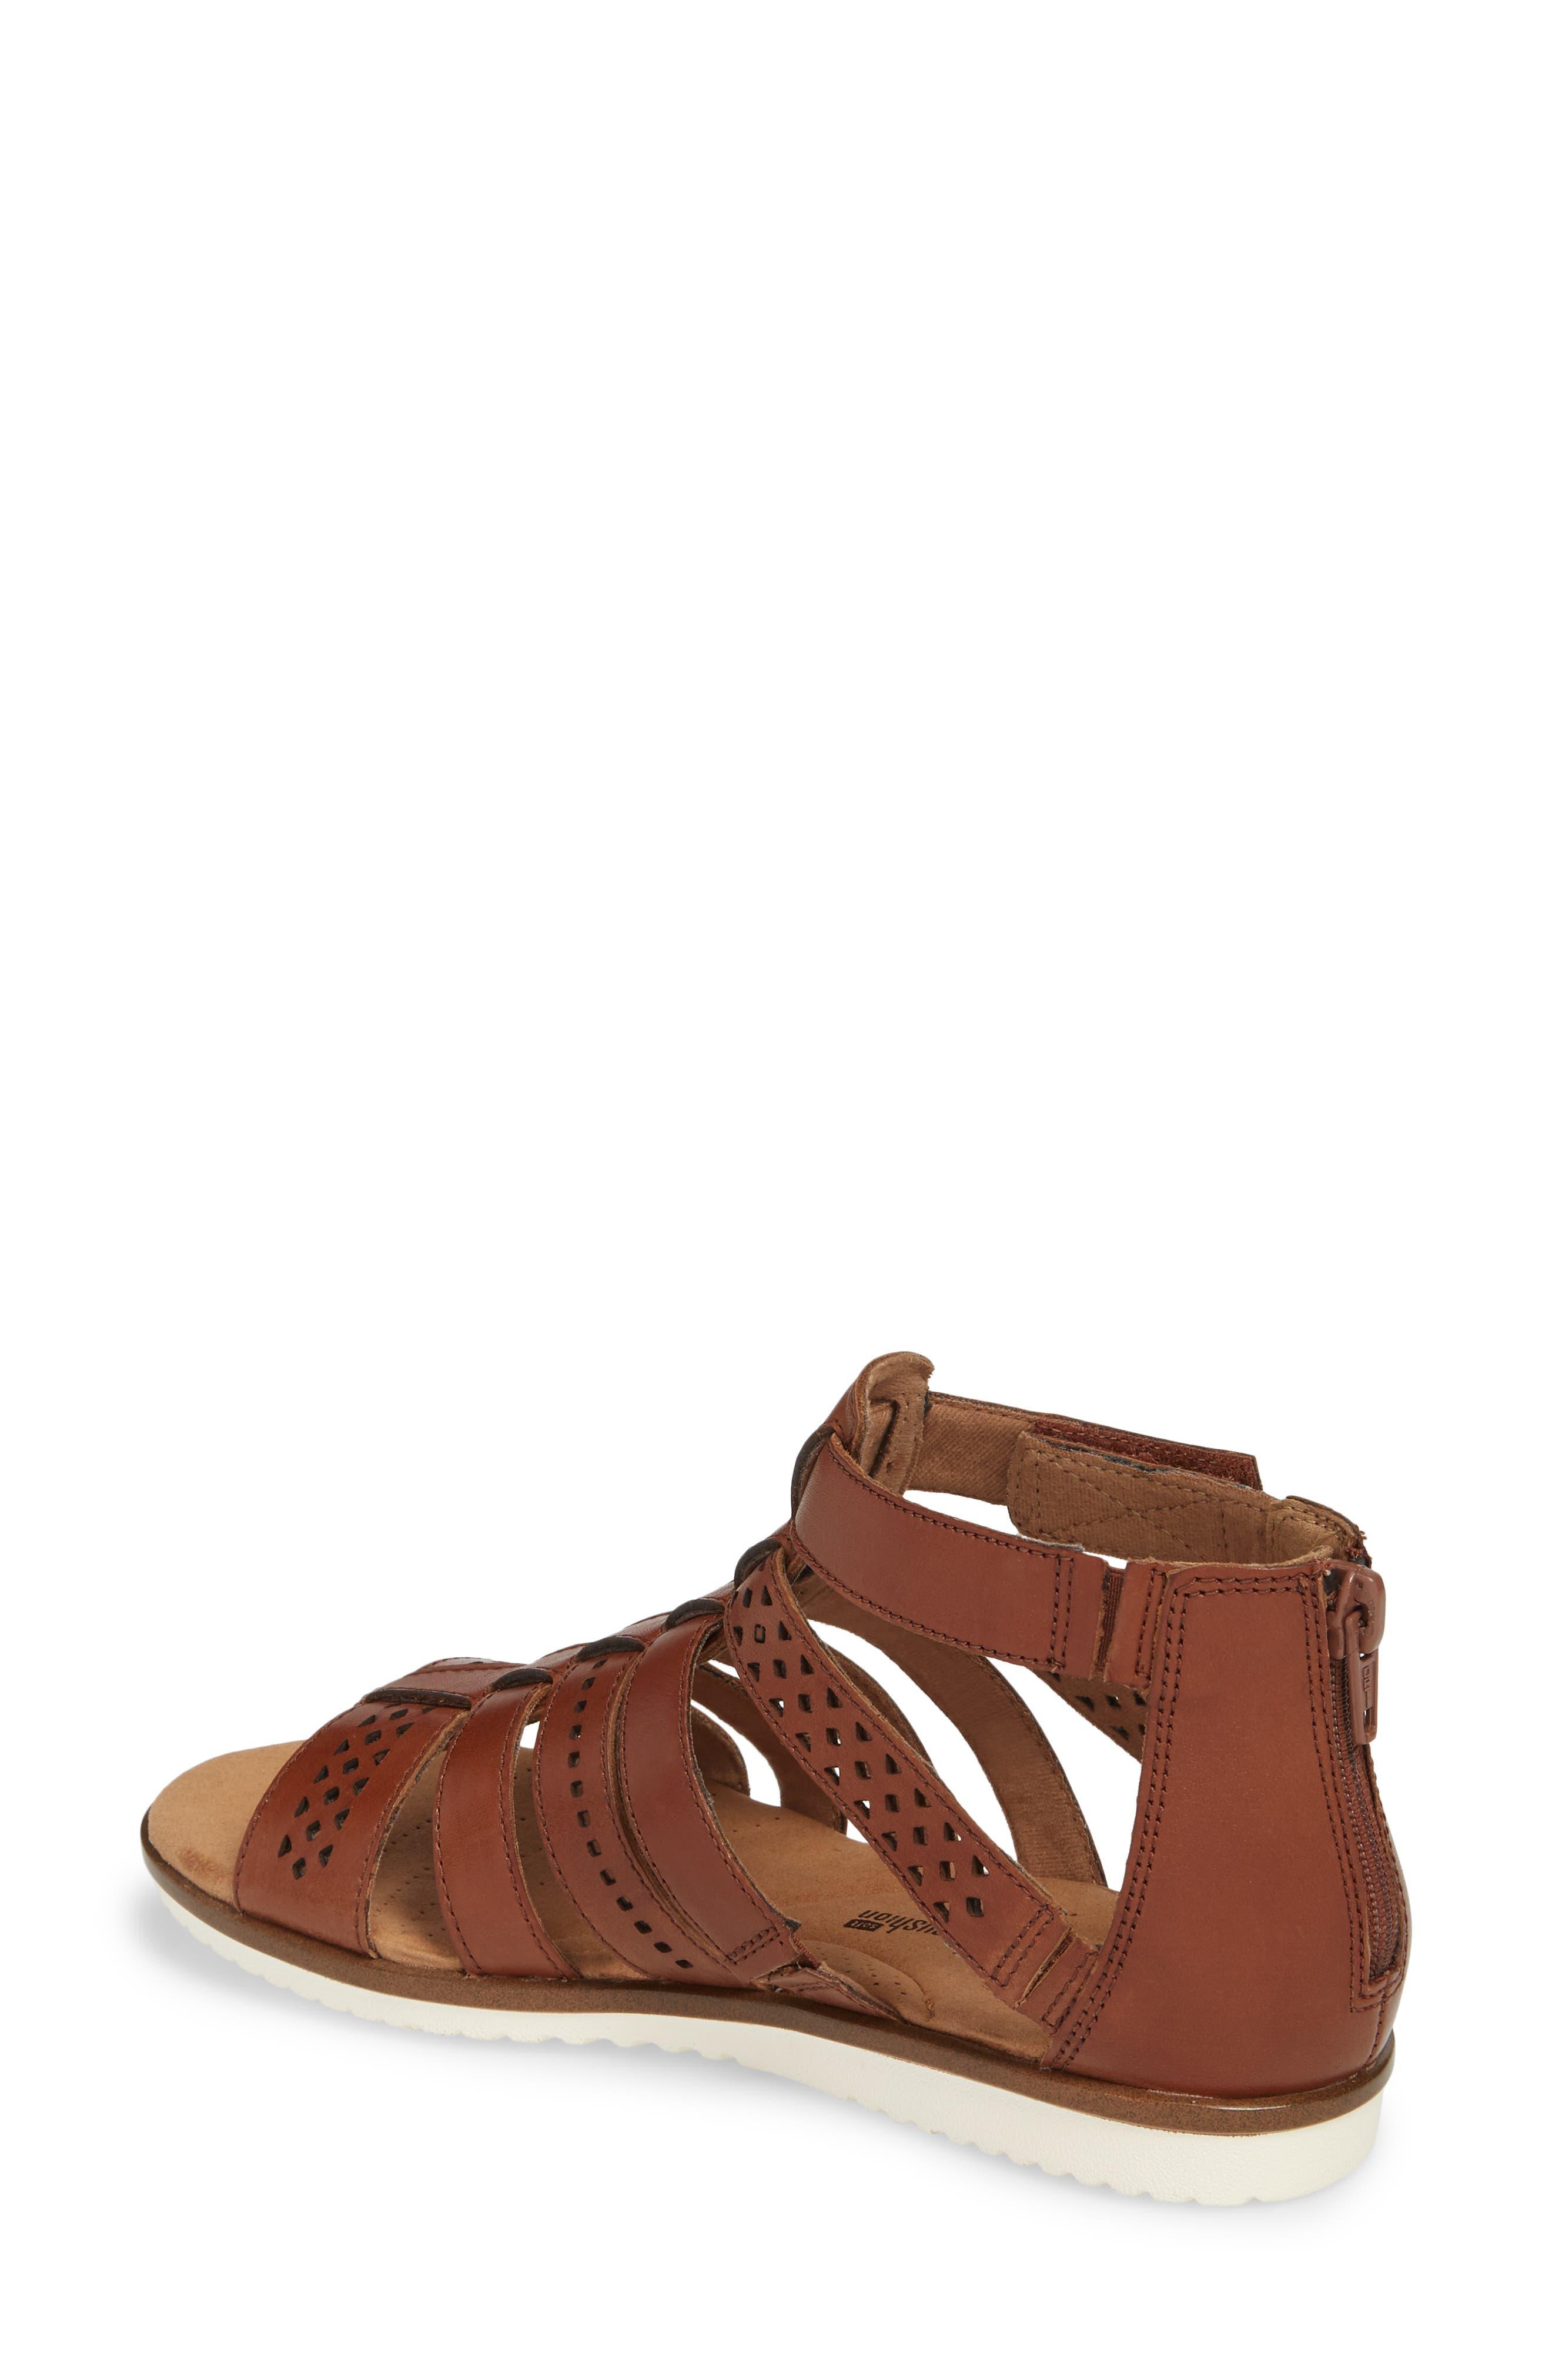 Kele Lotus Sandal,                             Alternate thumbnail 2, color,                             Beige Leather